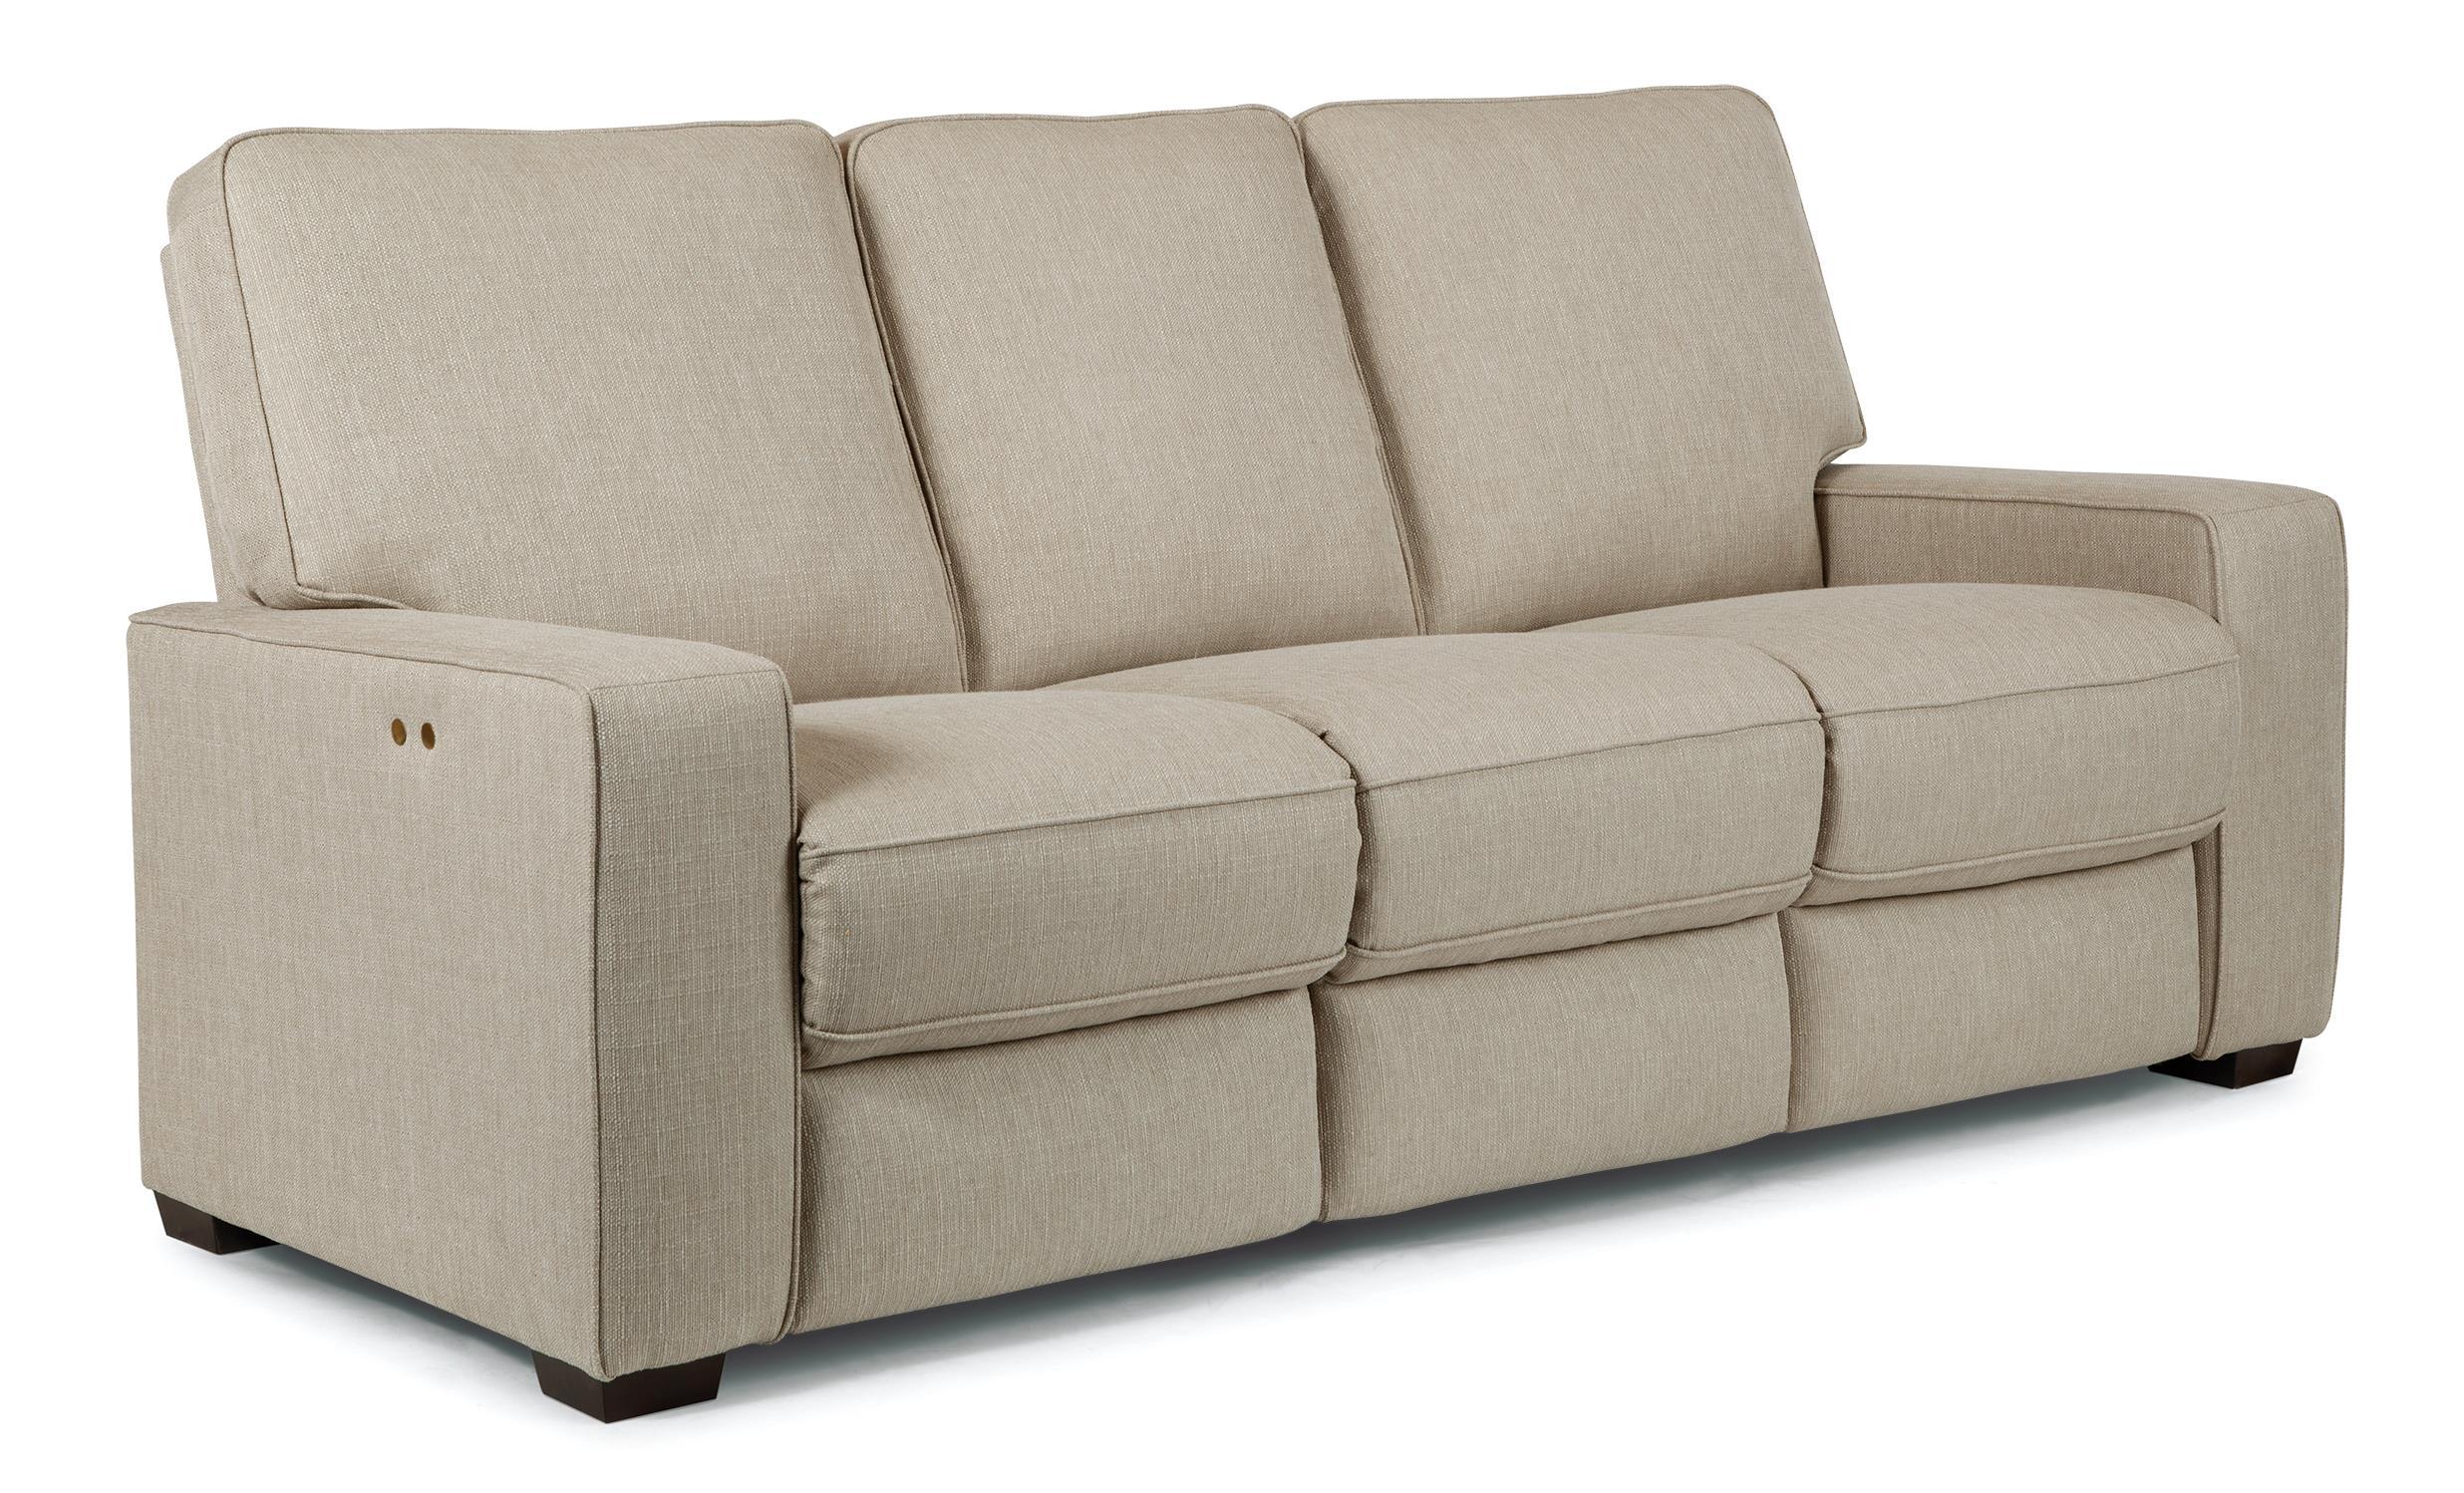 Best reclining sofa home decor - Sofa reclinable ...